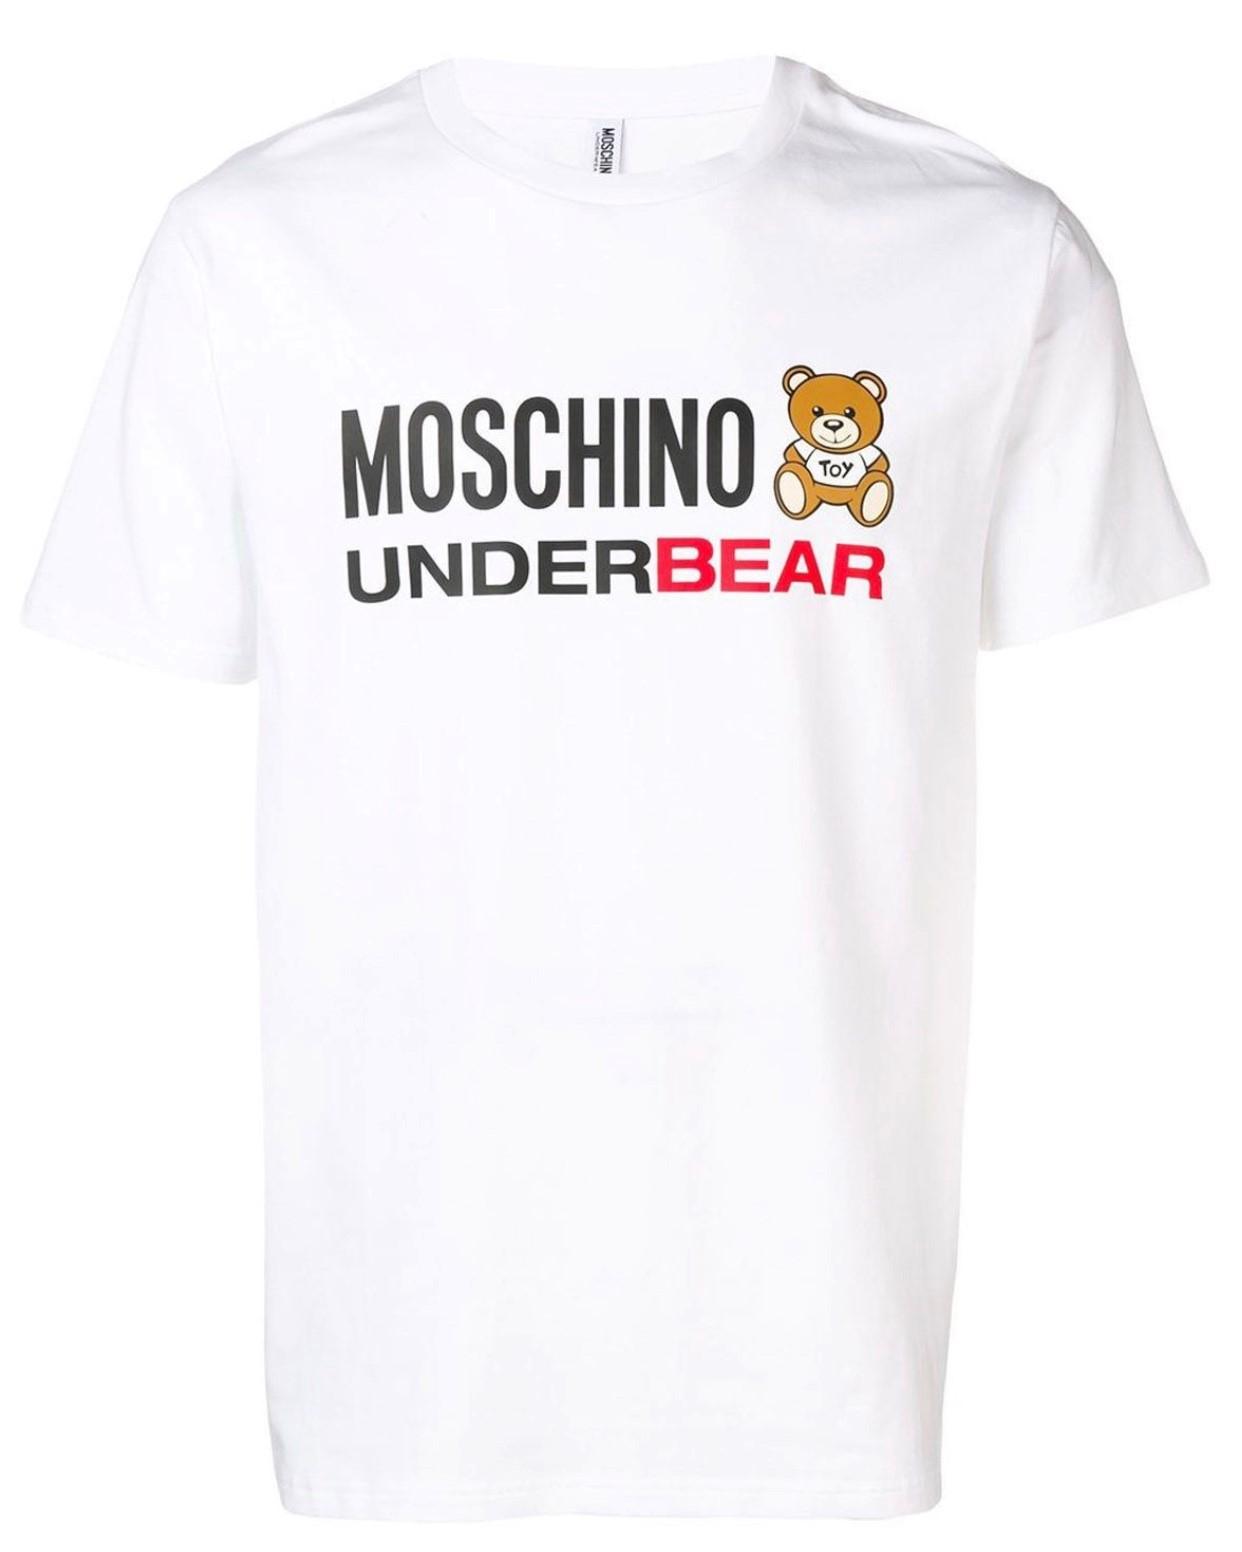 T-shirt moschino underbear